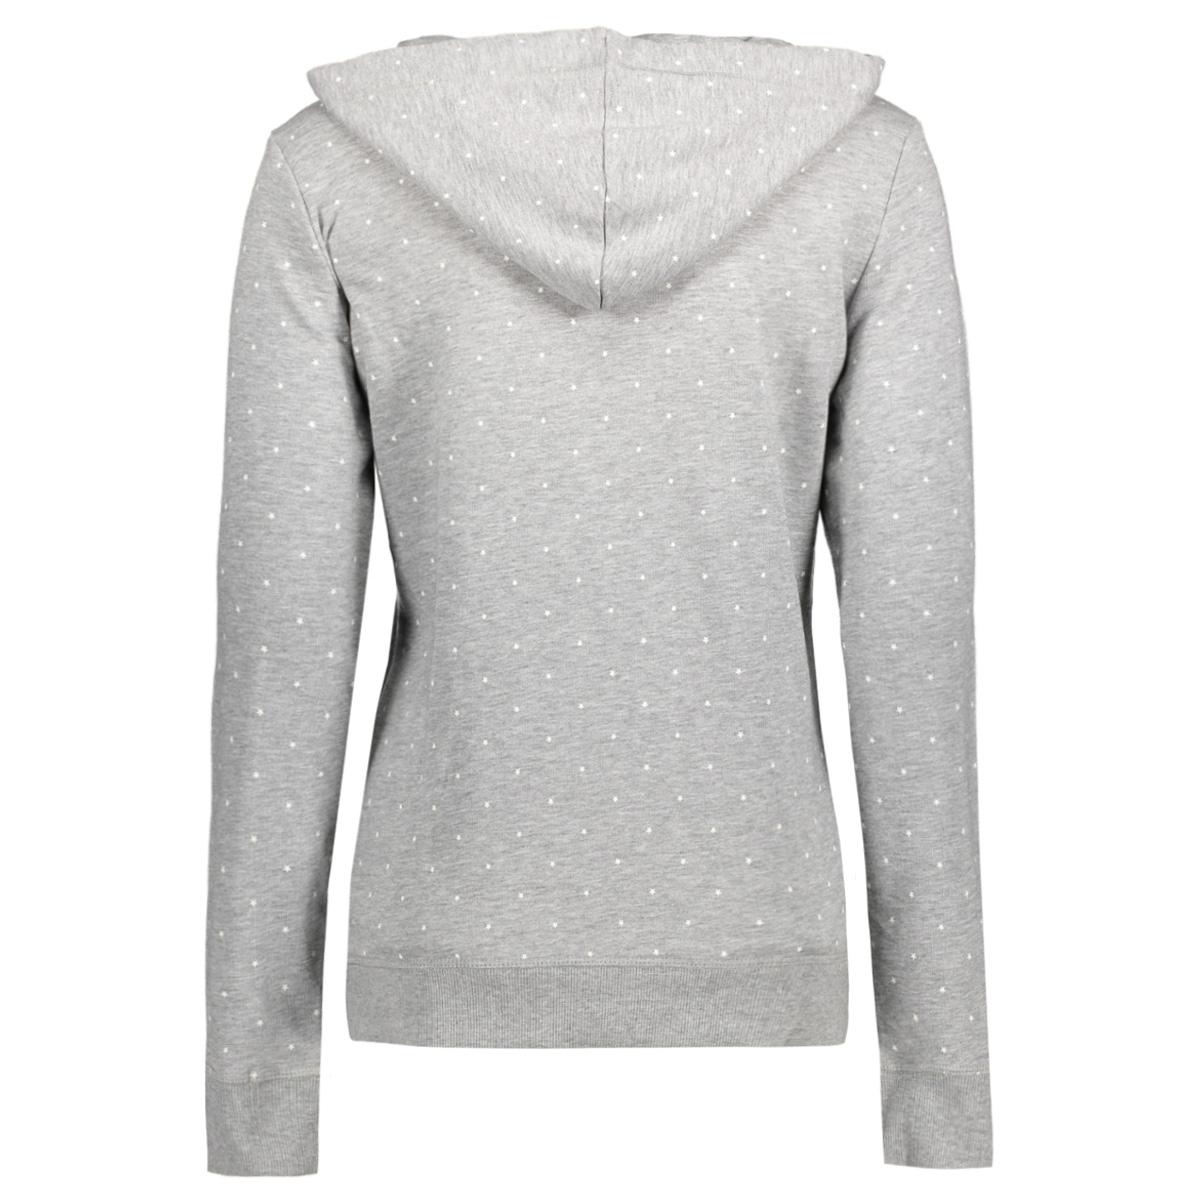 2531354.09.71 tom tailor sweater 2973